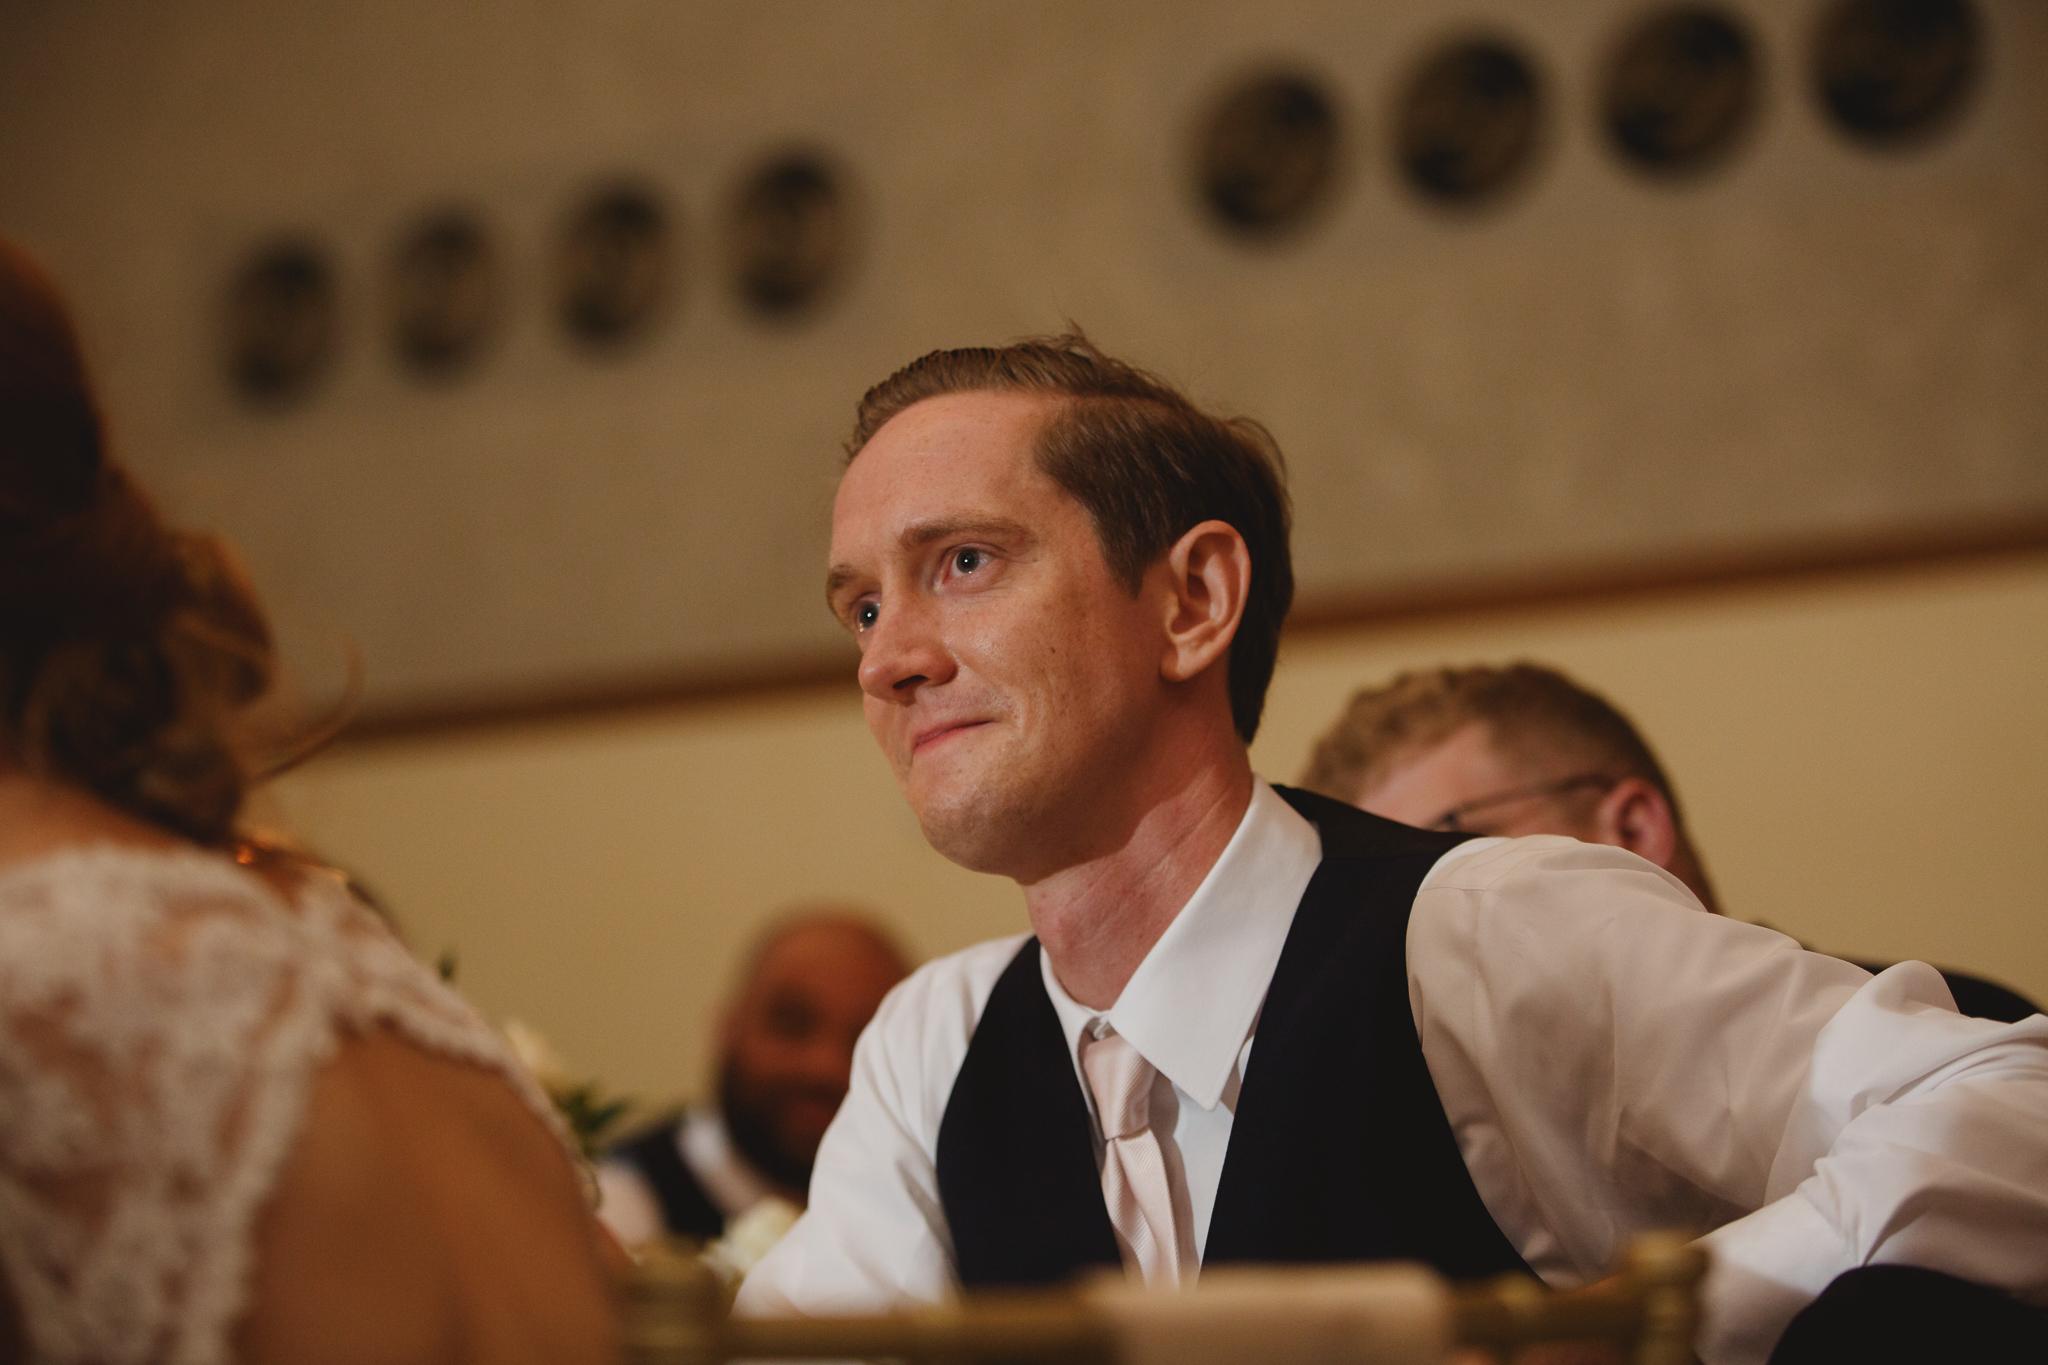 Michael and Kelly - the ashton depot - wedding DFW - wedding photographer- elizalde photography (105 of 150).jpg